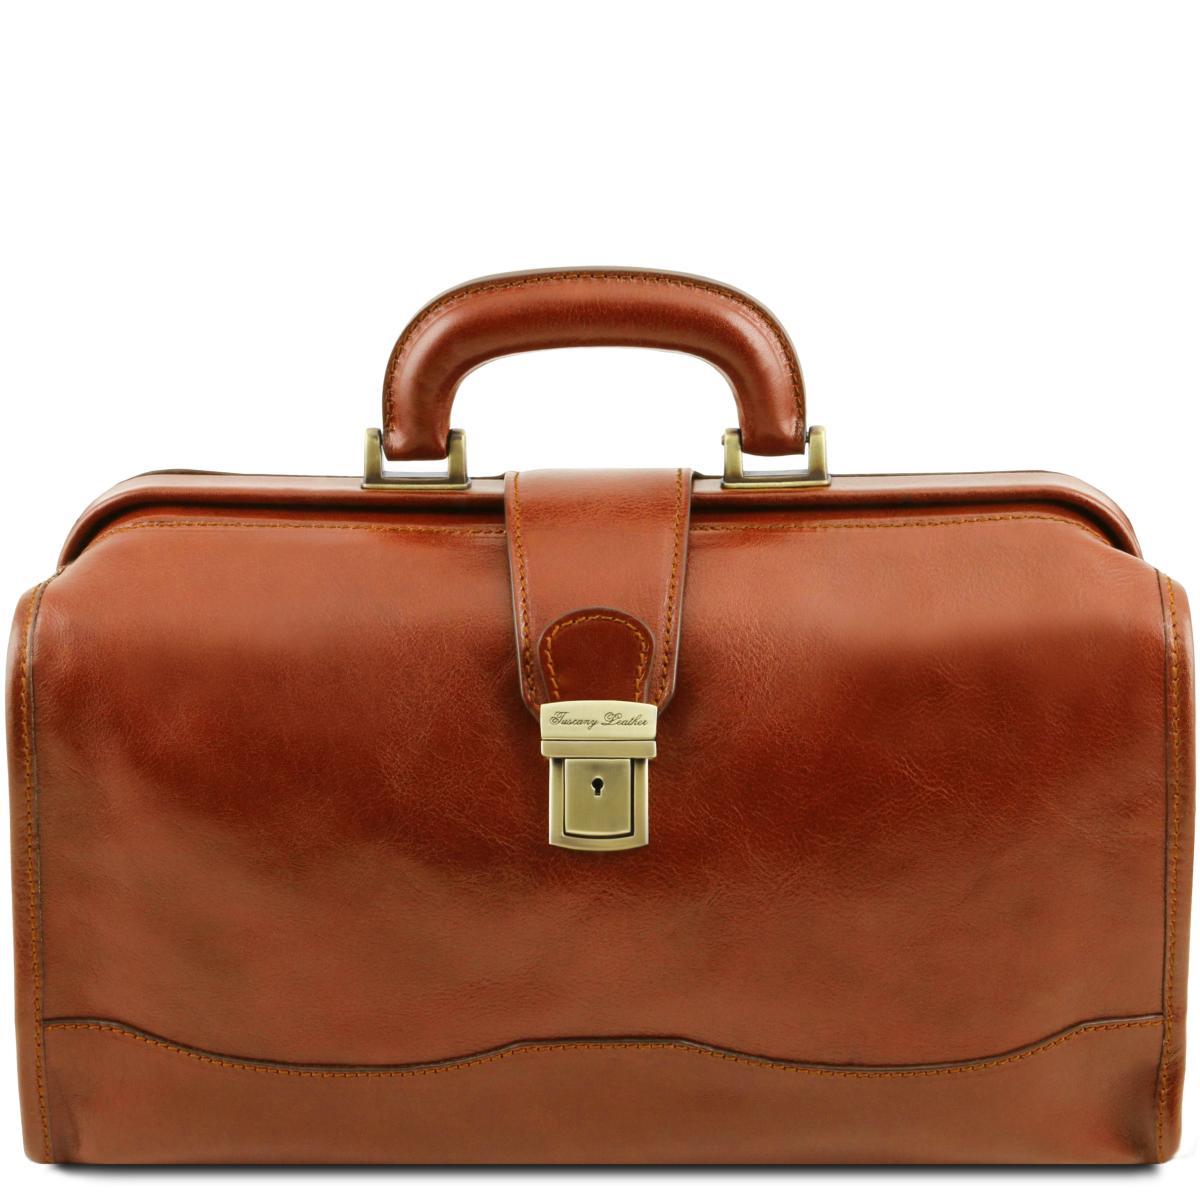 Sacoche Médicale Cuir Couleur Camel Tuscany Leather